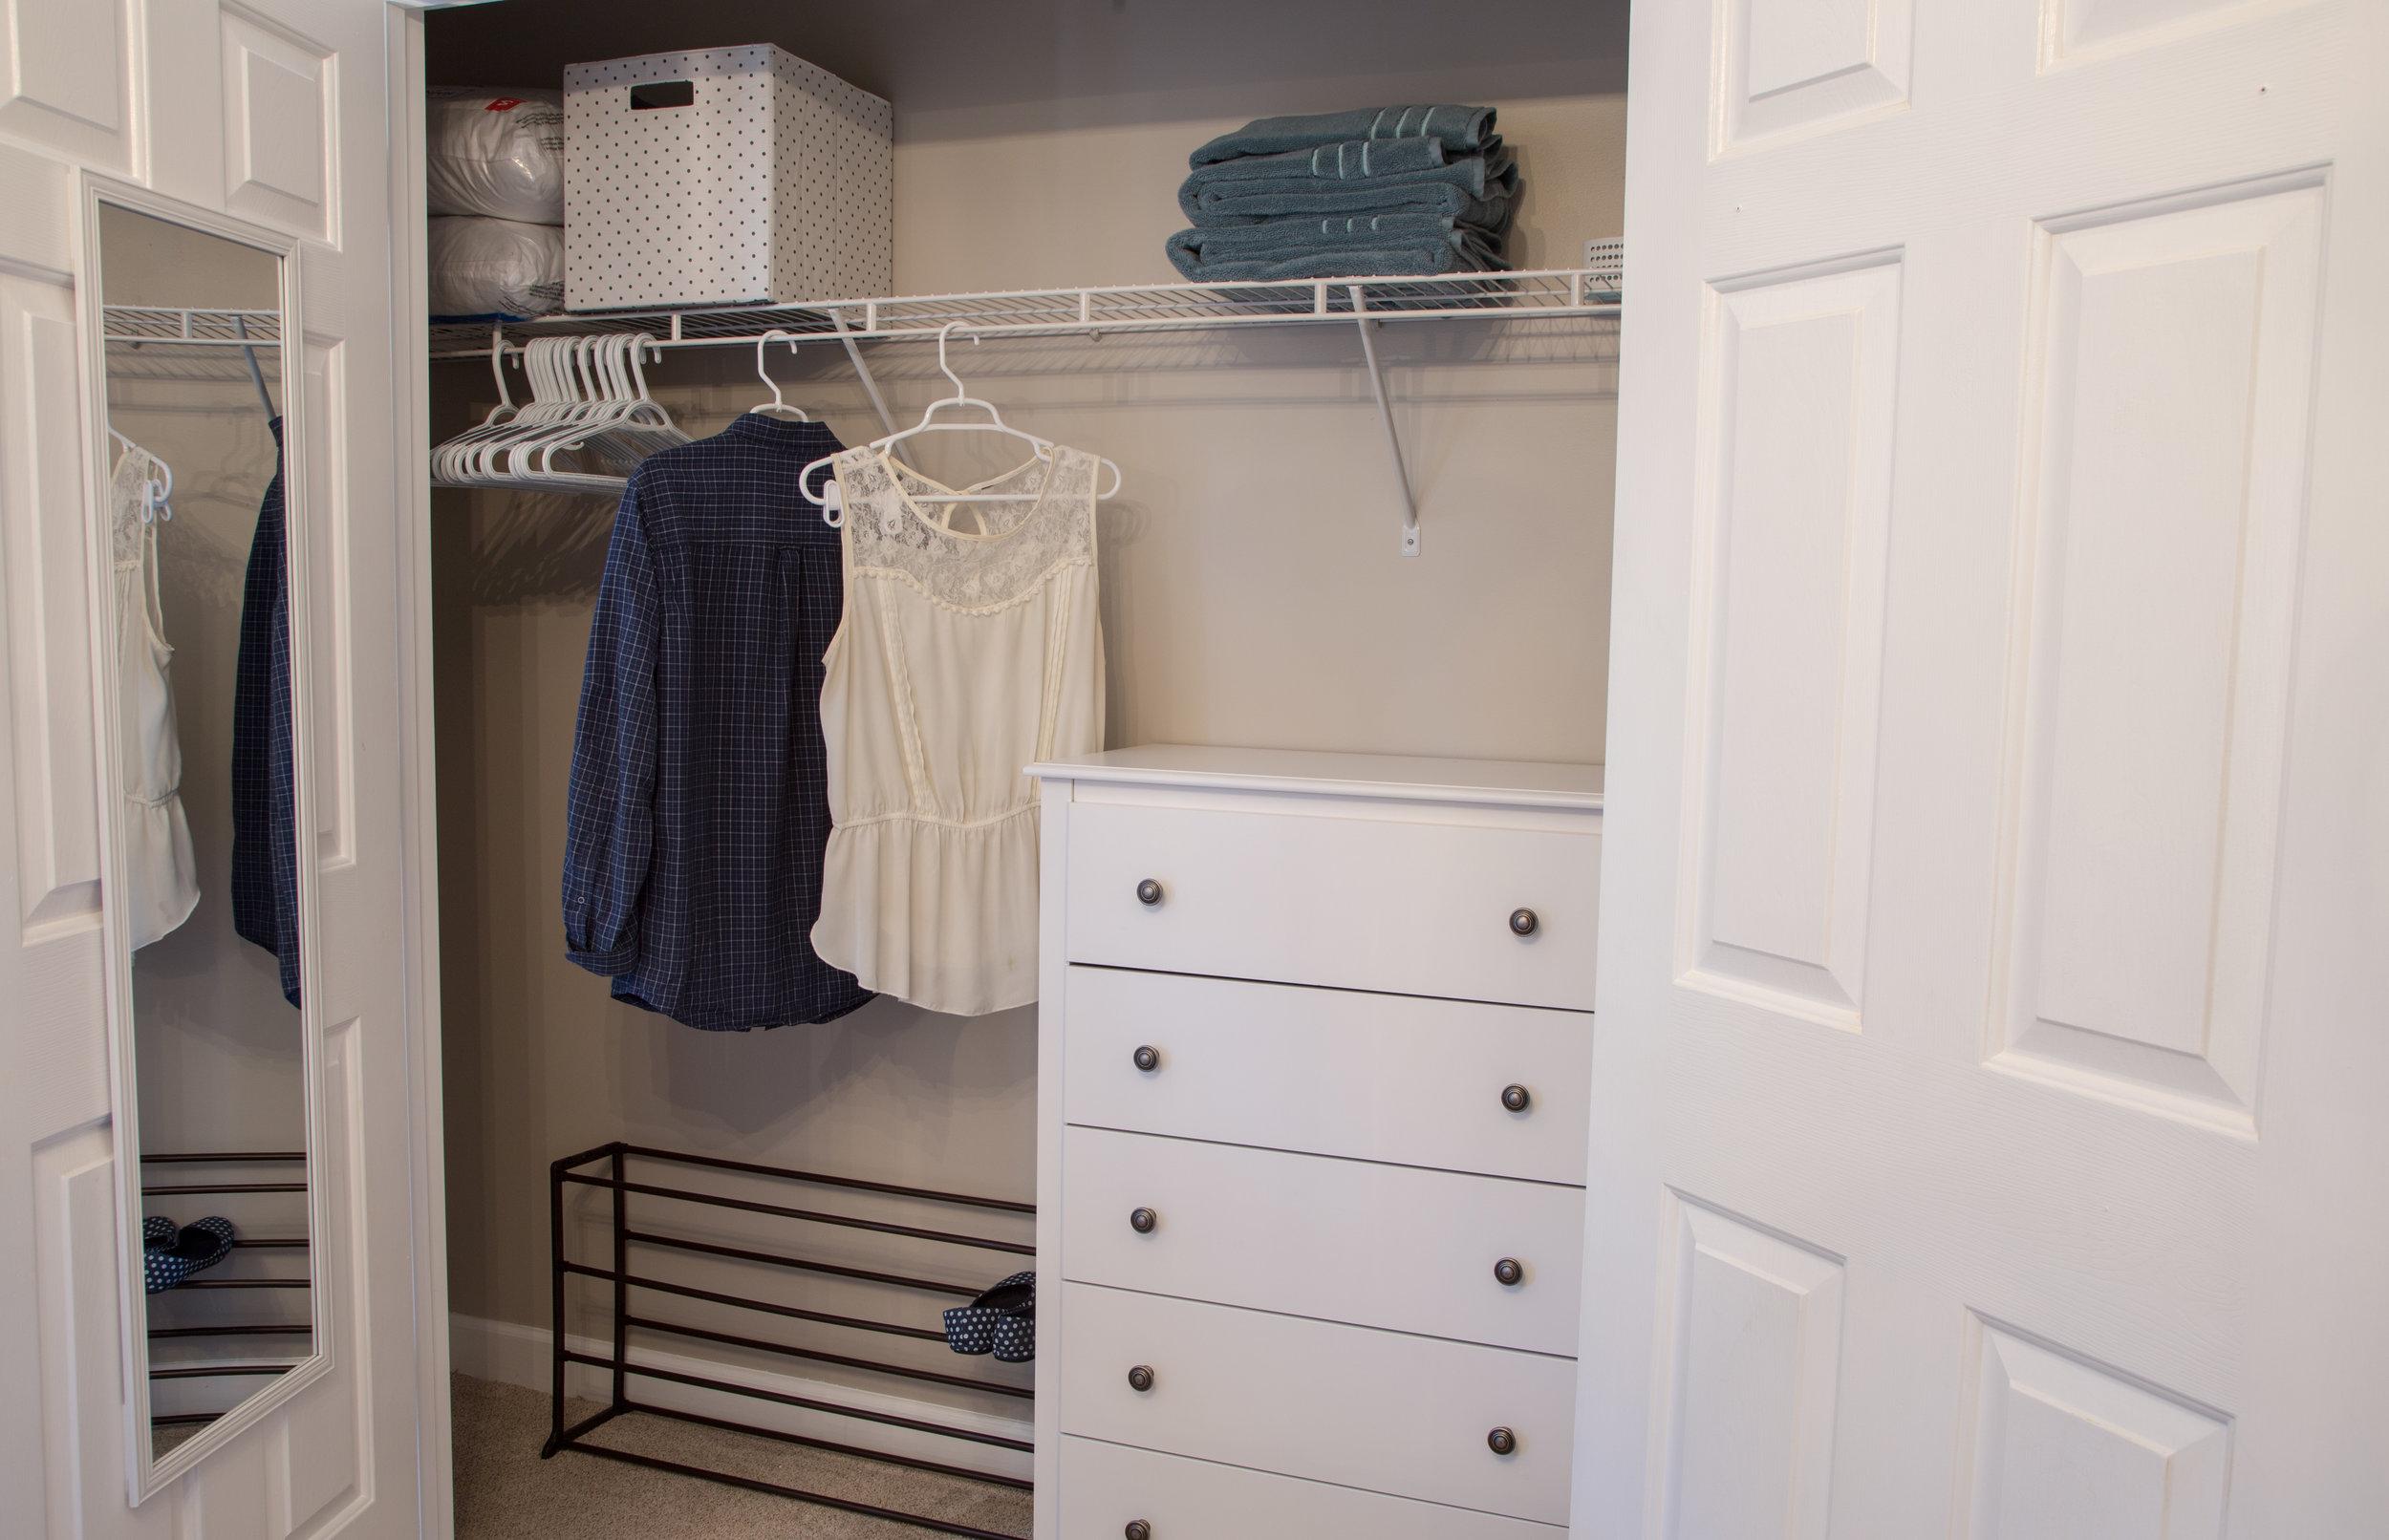 Spacious closets throughout.